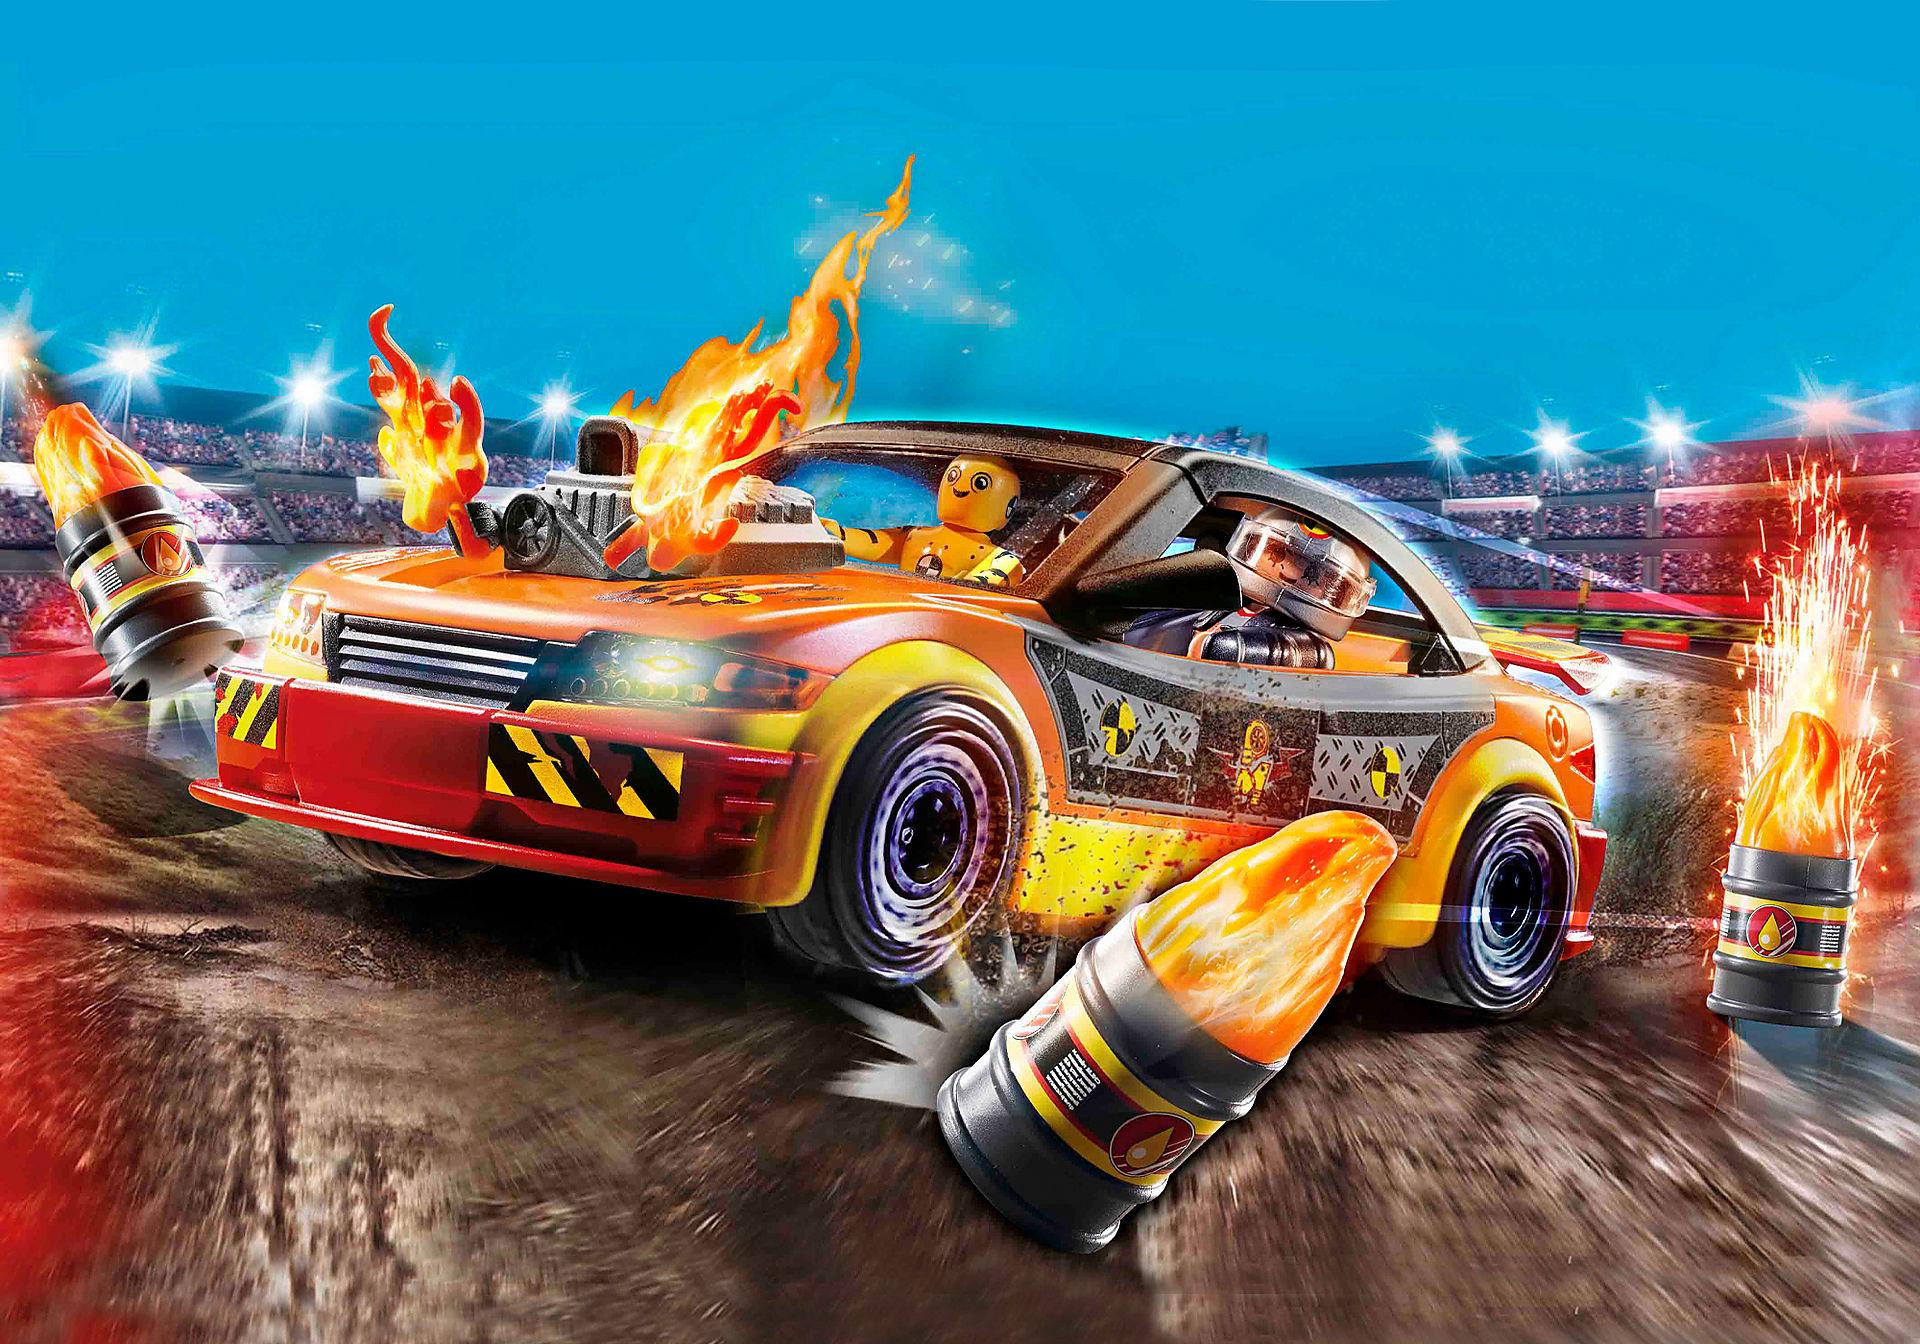 70551 Stunt Show Crash Car zoom image1